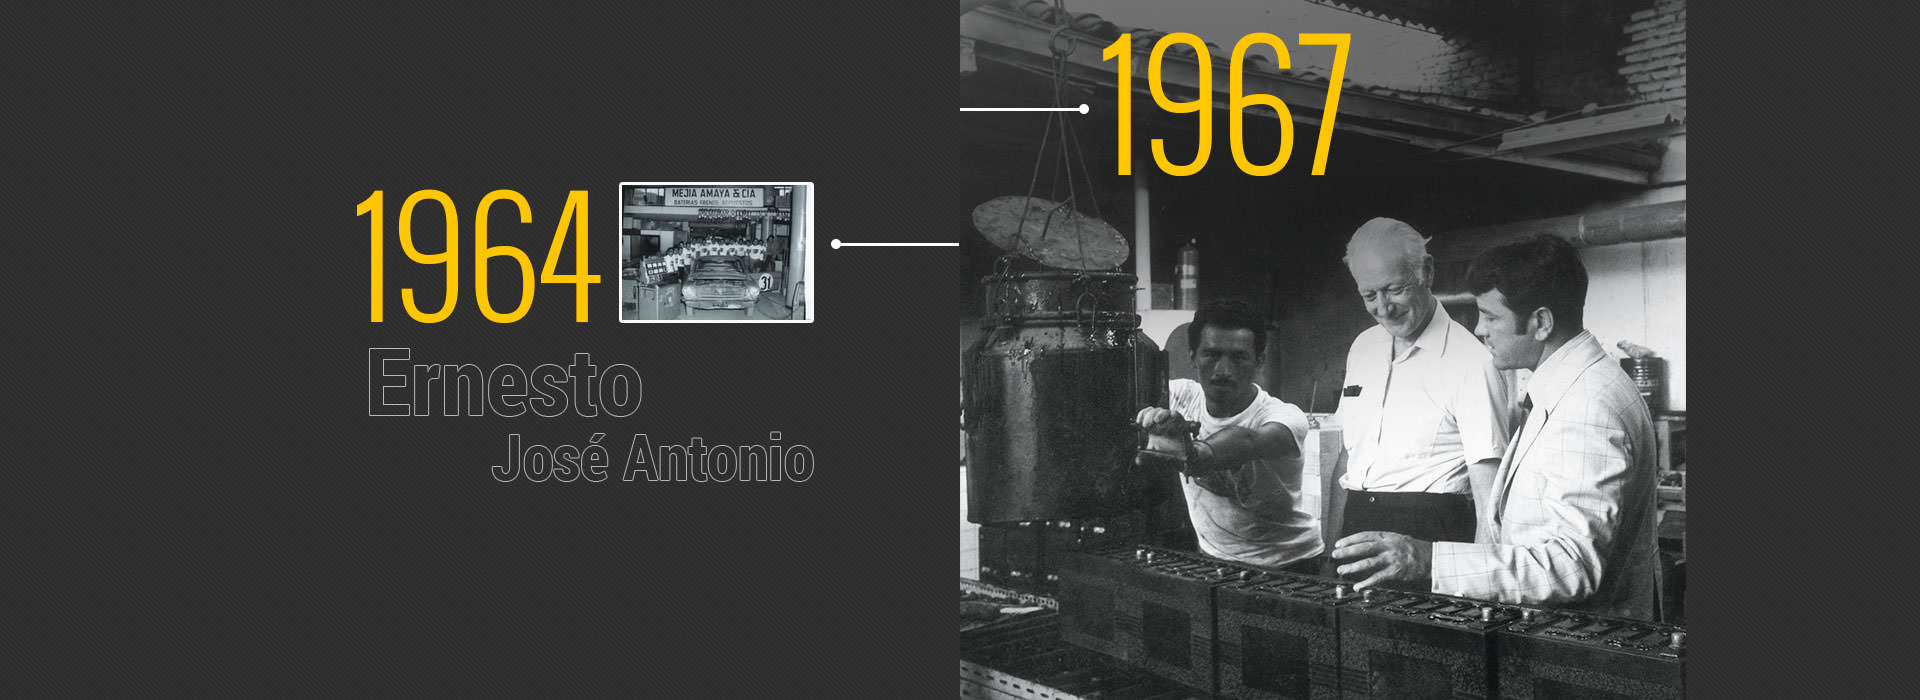 Ernesto with 1964-1967 Dates